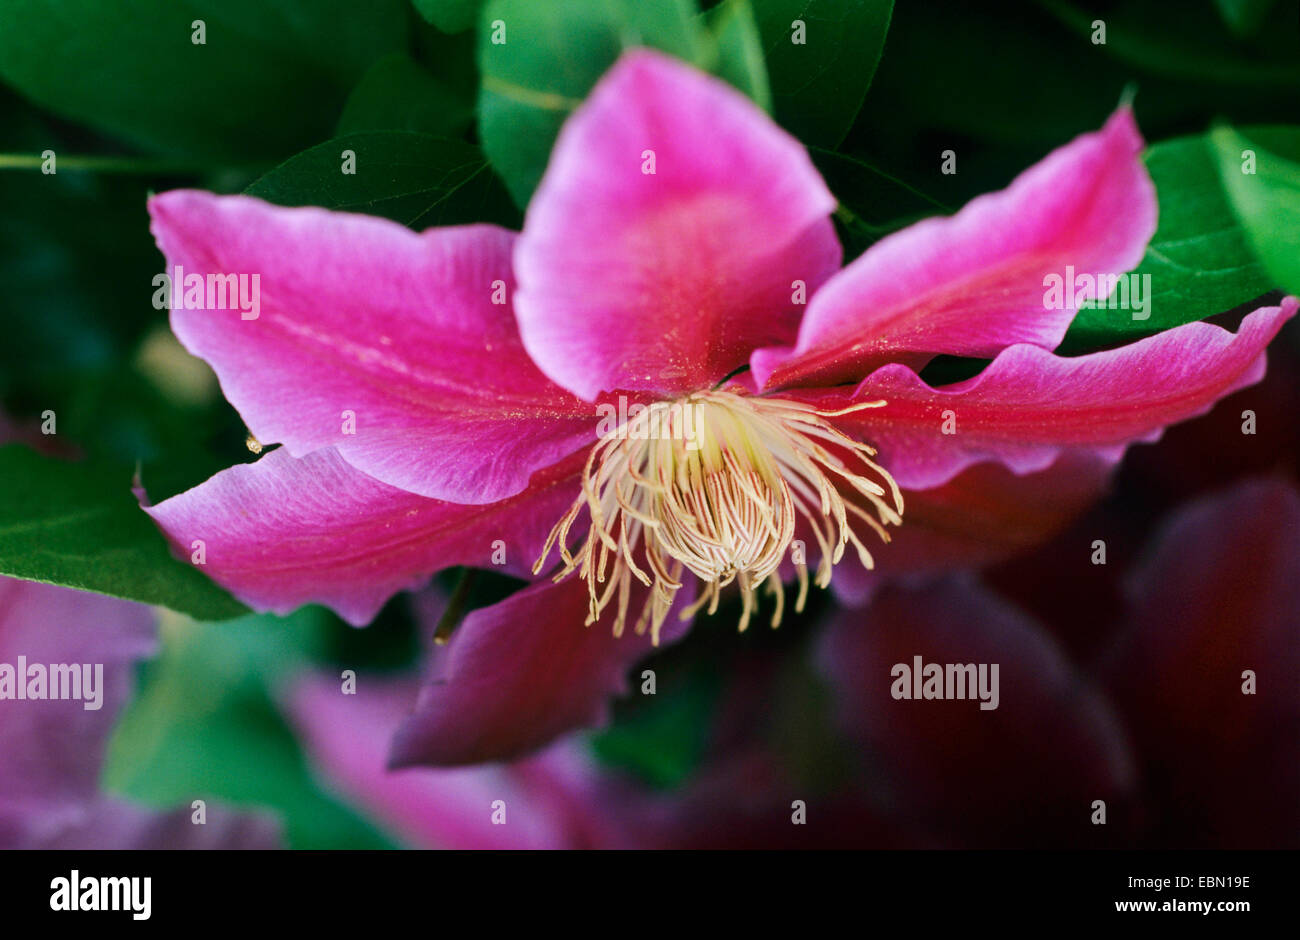 clematis, virgins-bower (Clematis 'Dr. Ruppel', Clematis Dr. Ruppel), cultivar Dr. Ruppel - Stock Image